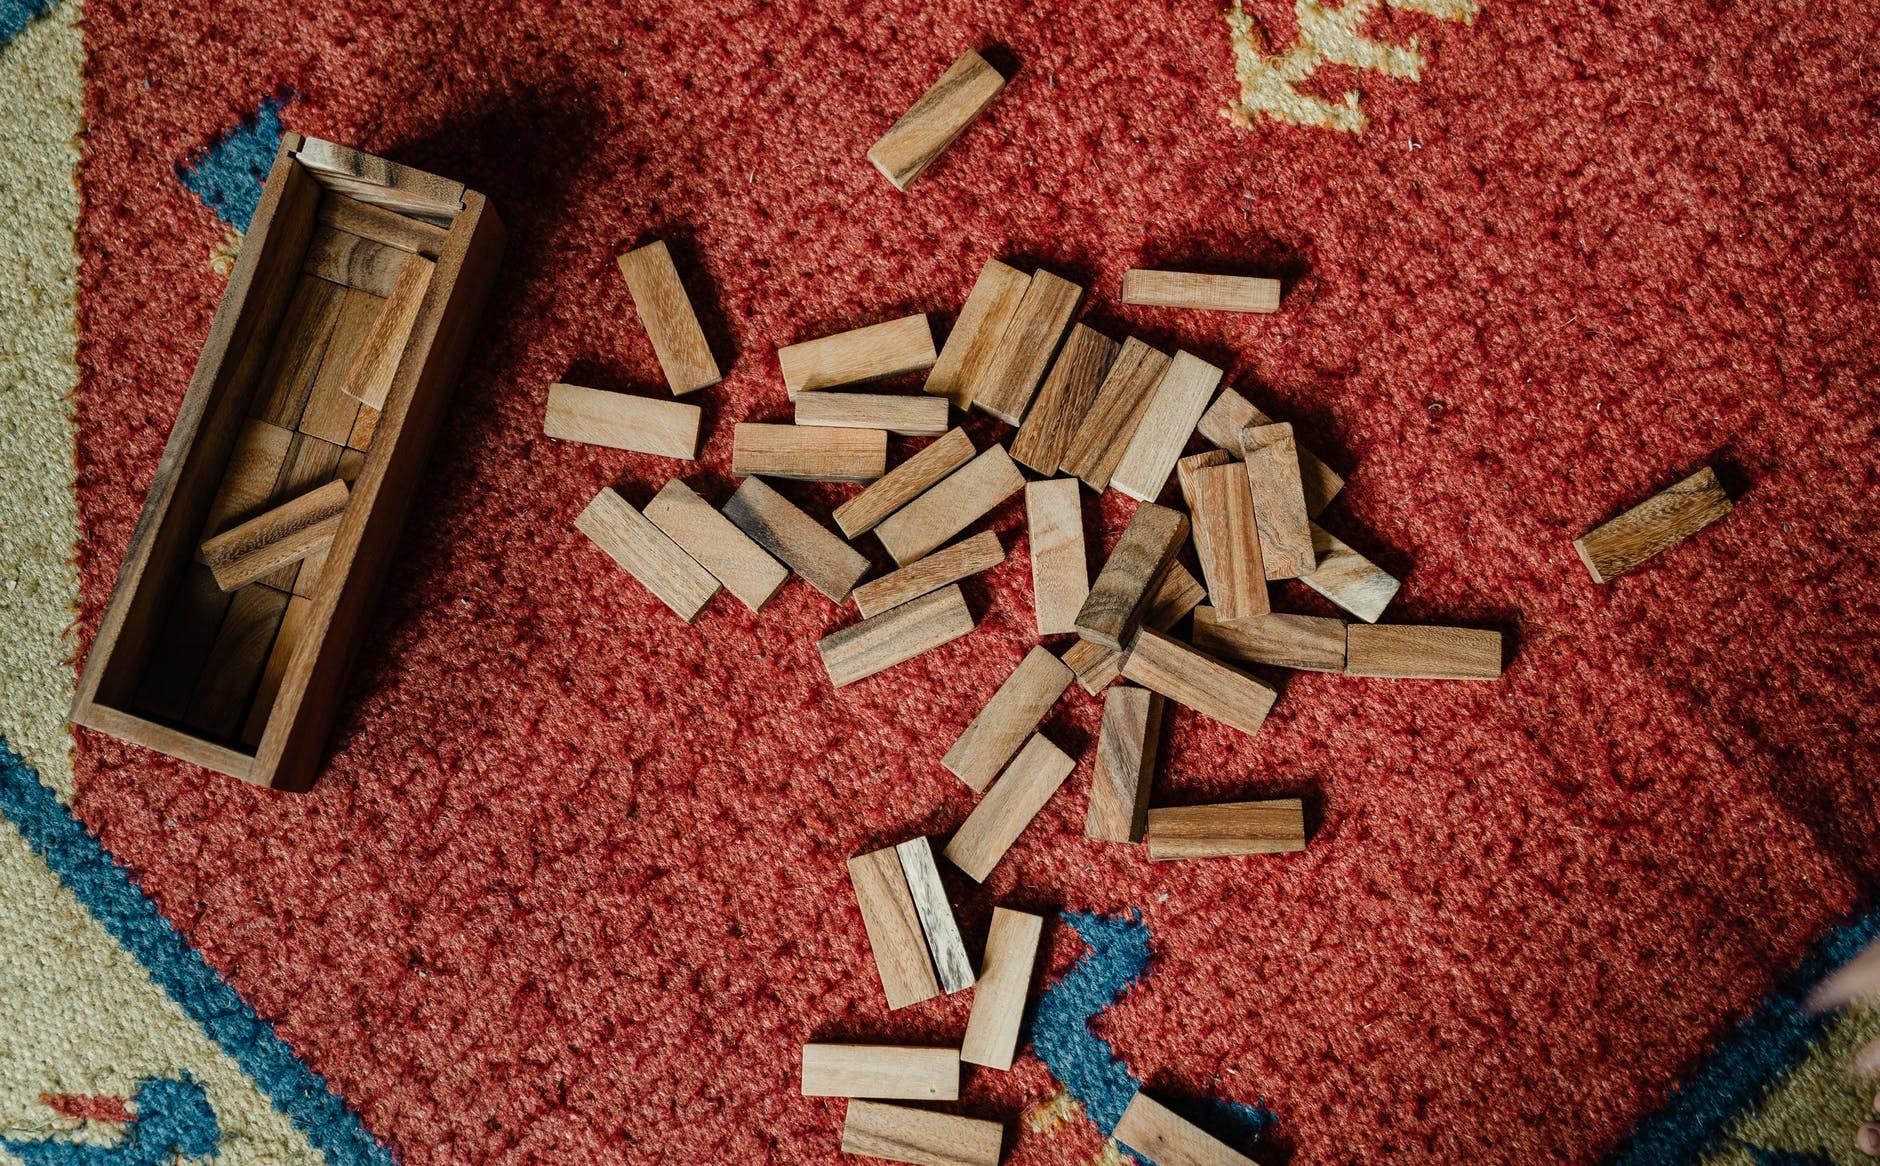 set of wooden blocks for jenga game